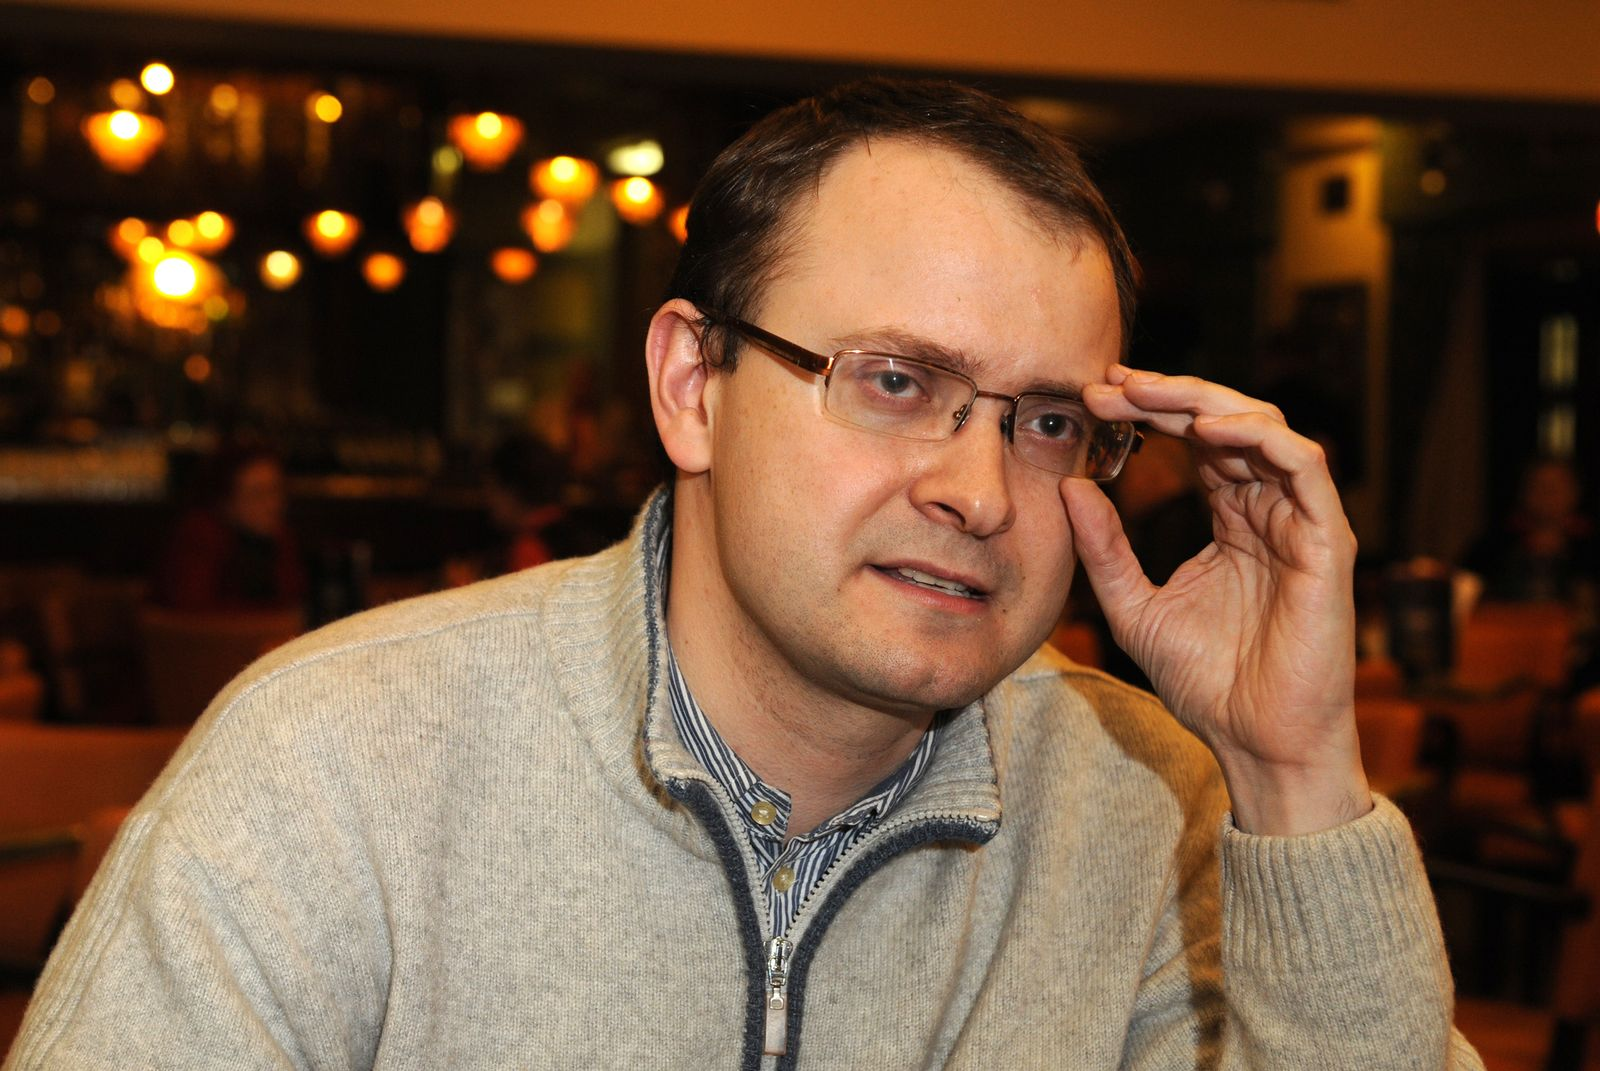 Ales Mikhalevich